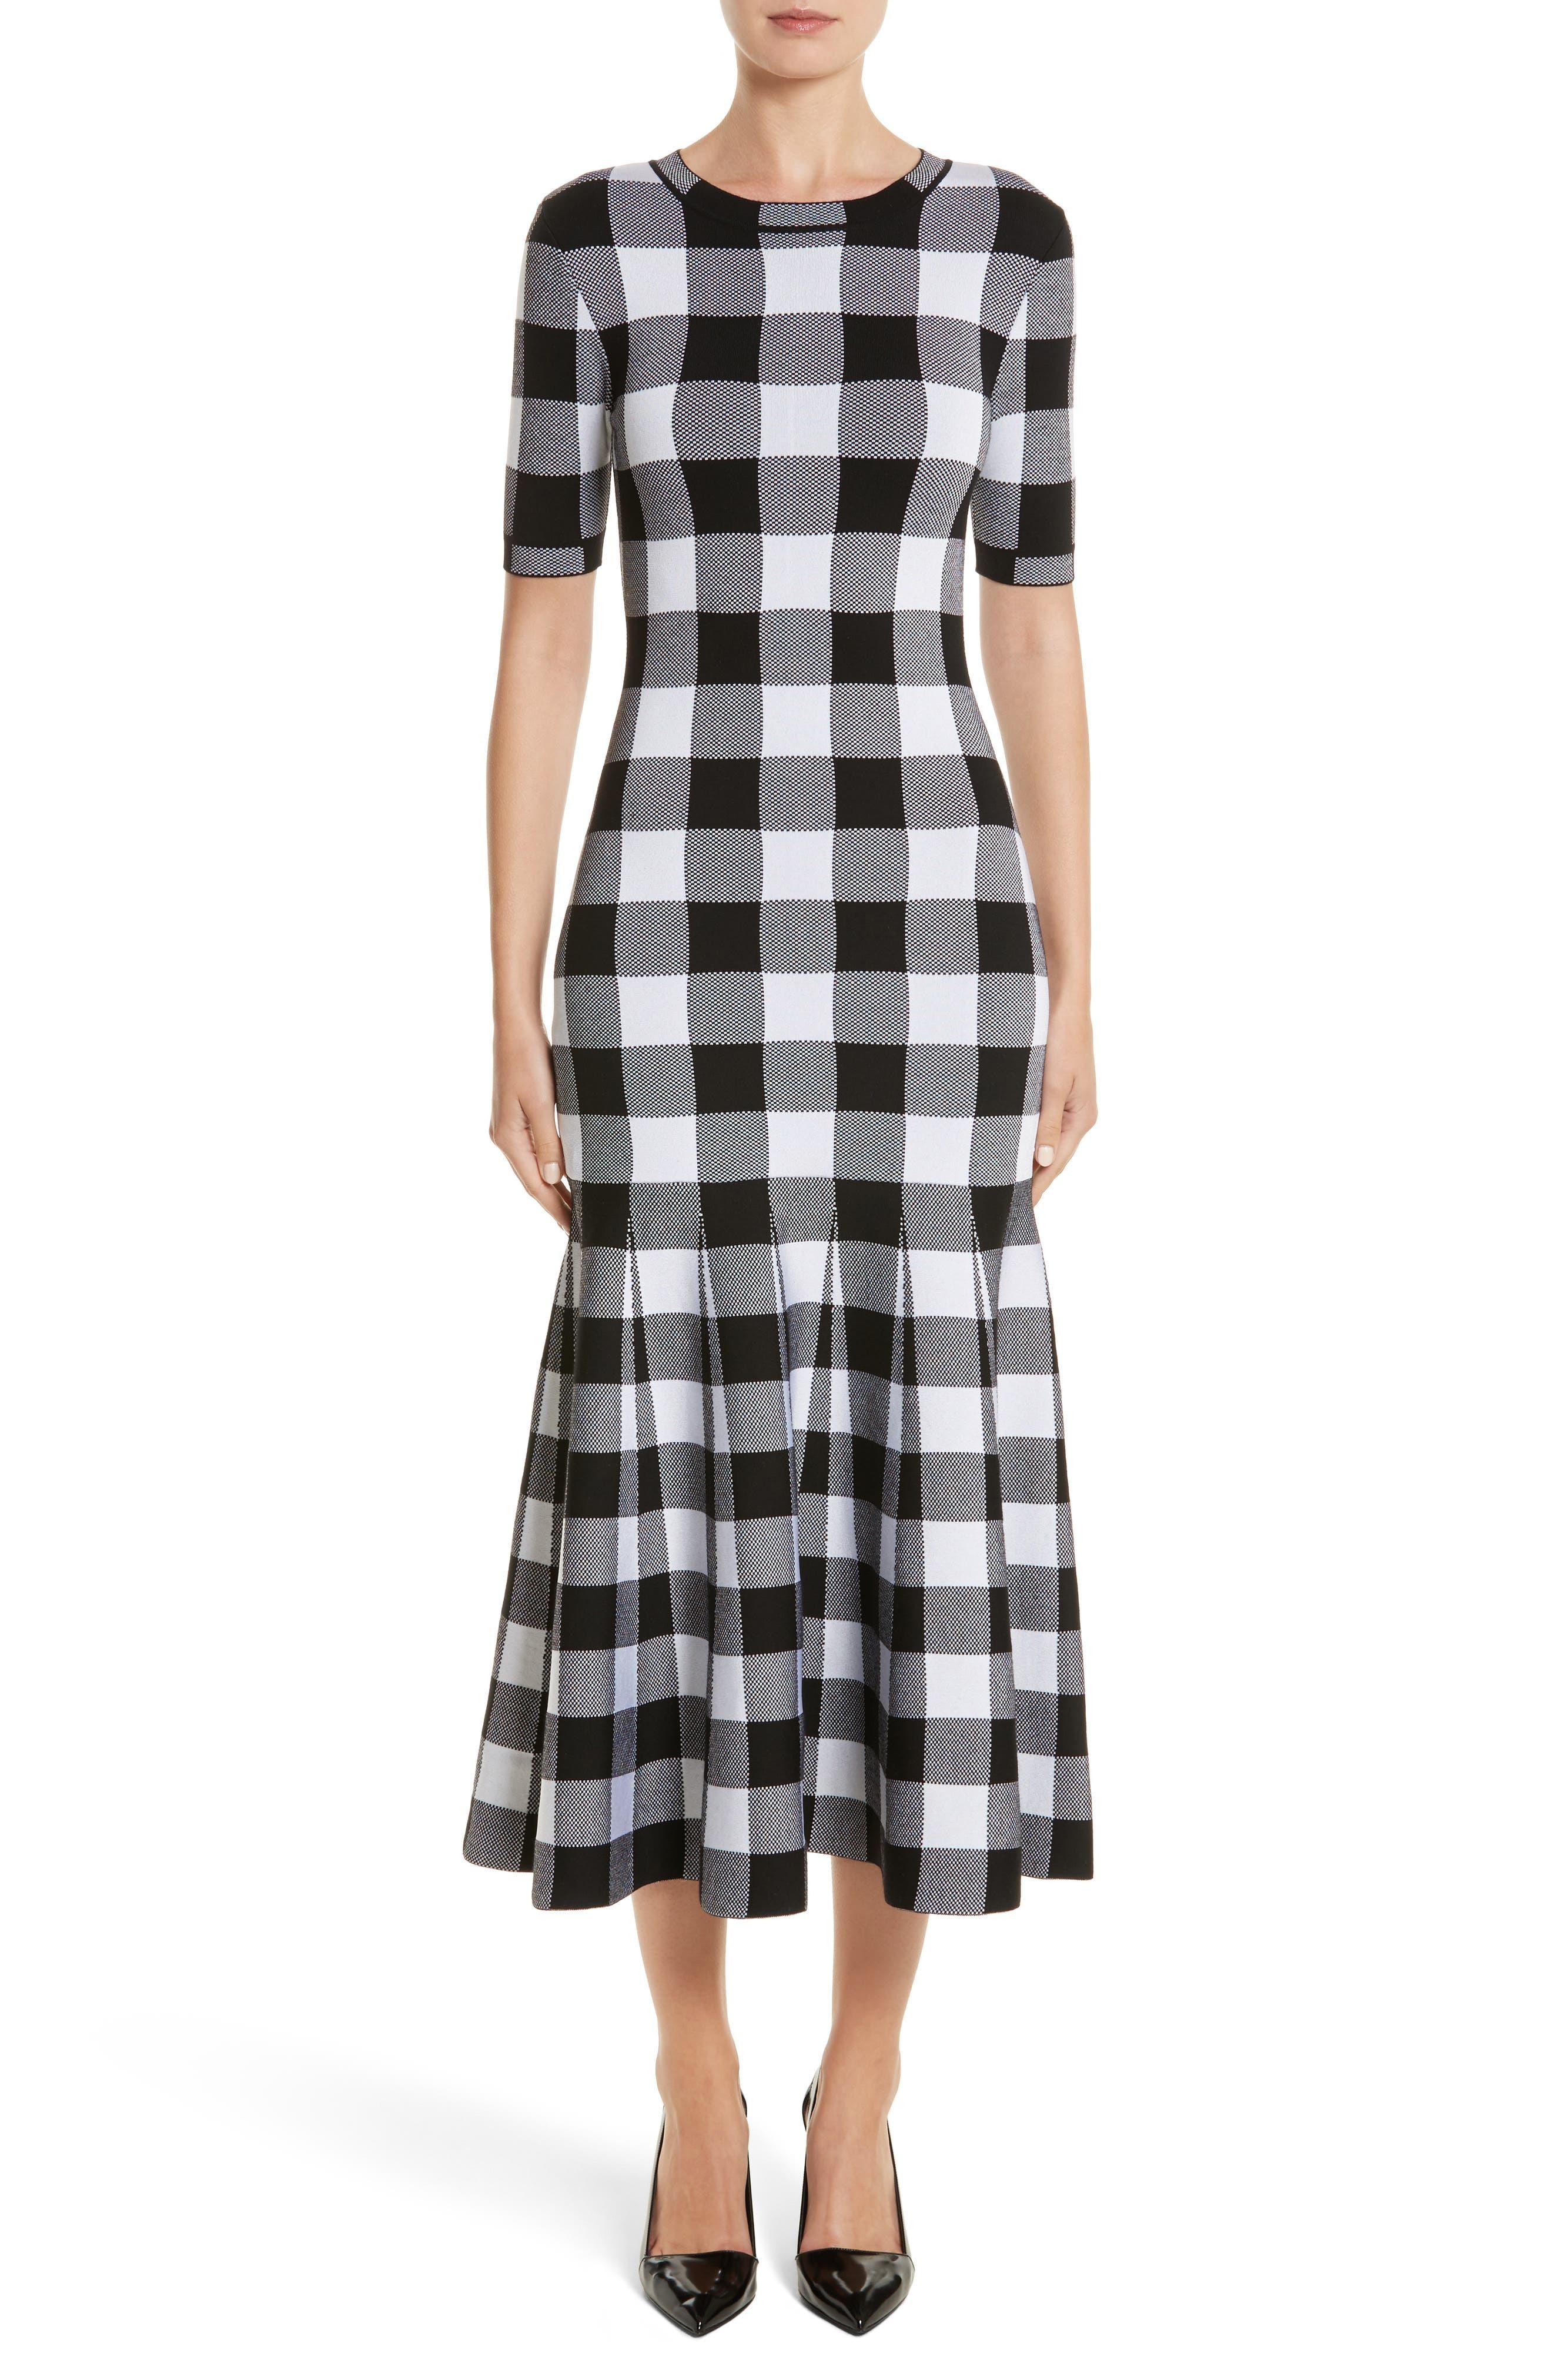 Buffalo Check Knit Flare Hem Dress,                             Main thumbnail 1, color,                             001